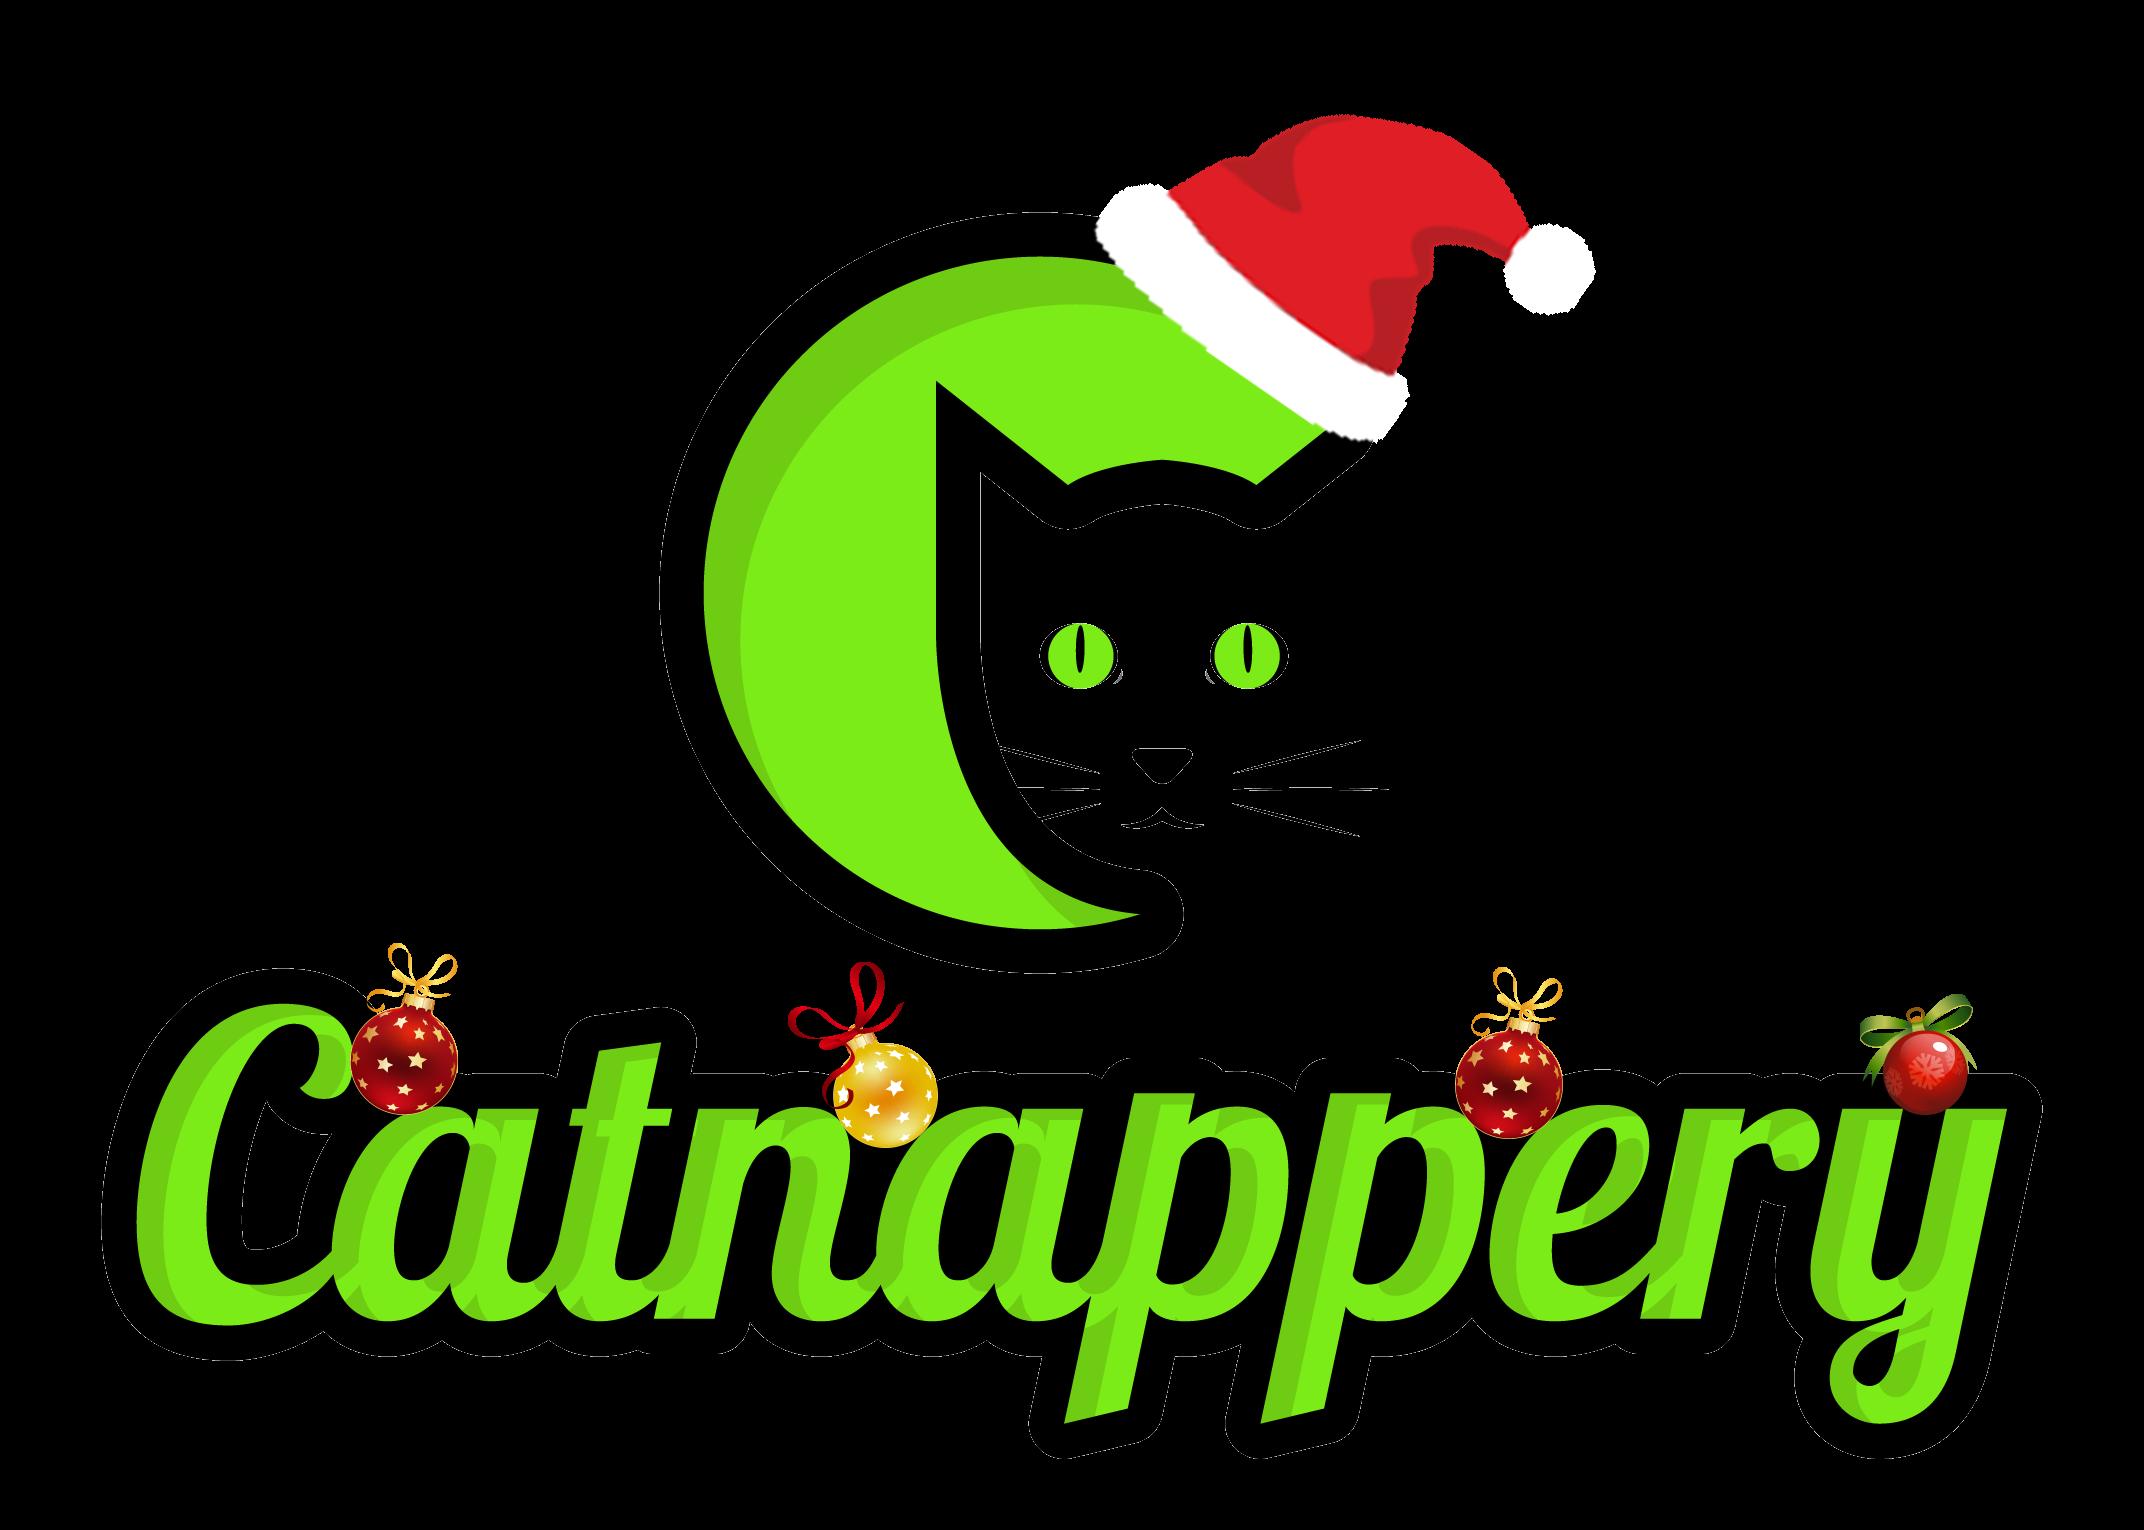 Catnappery